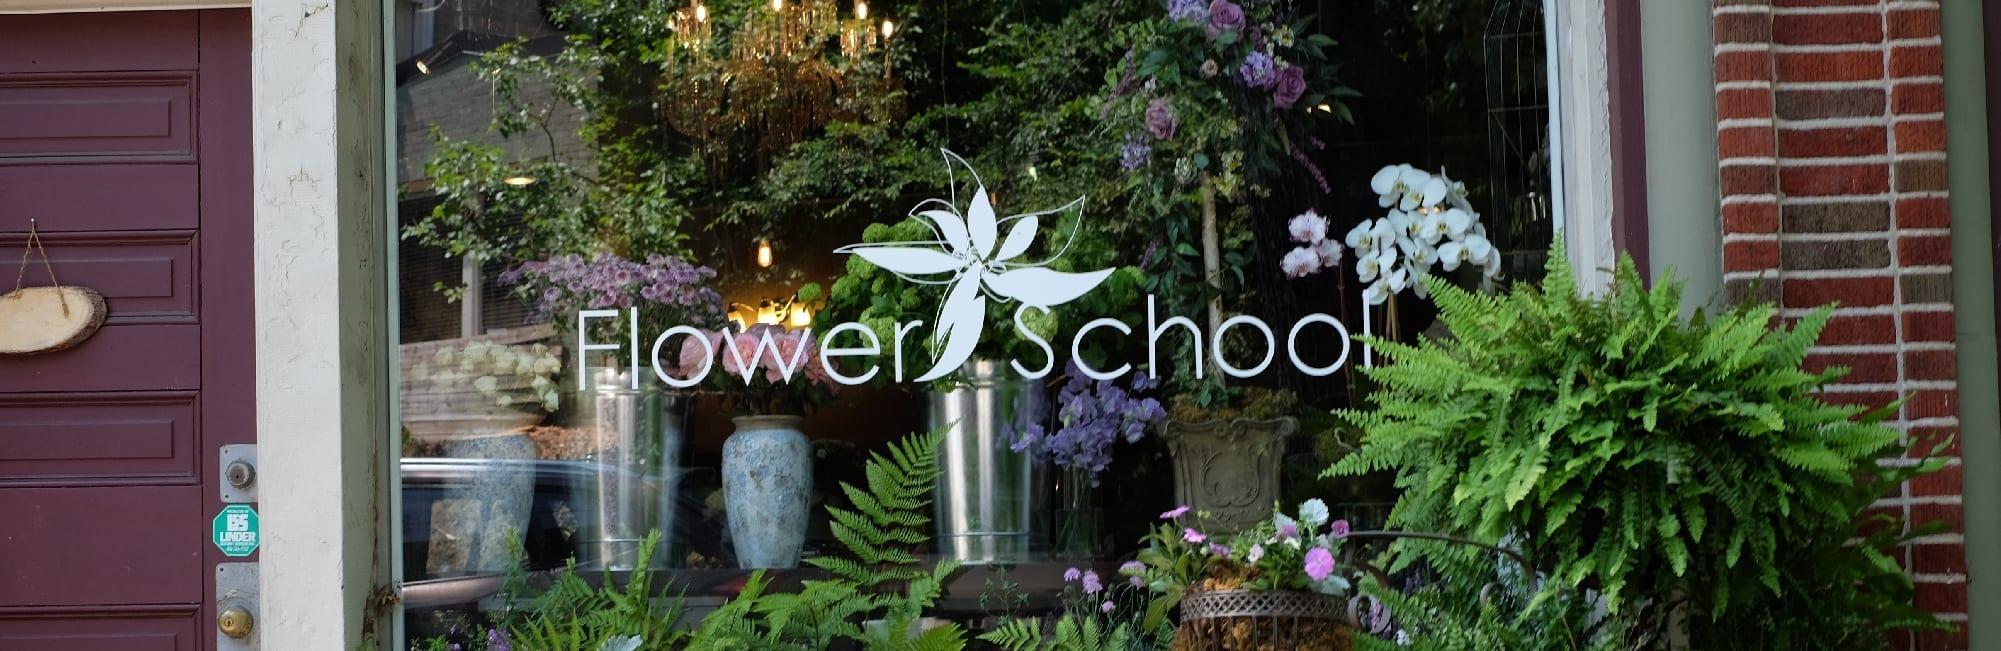 Int-Header-School